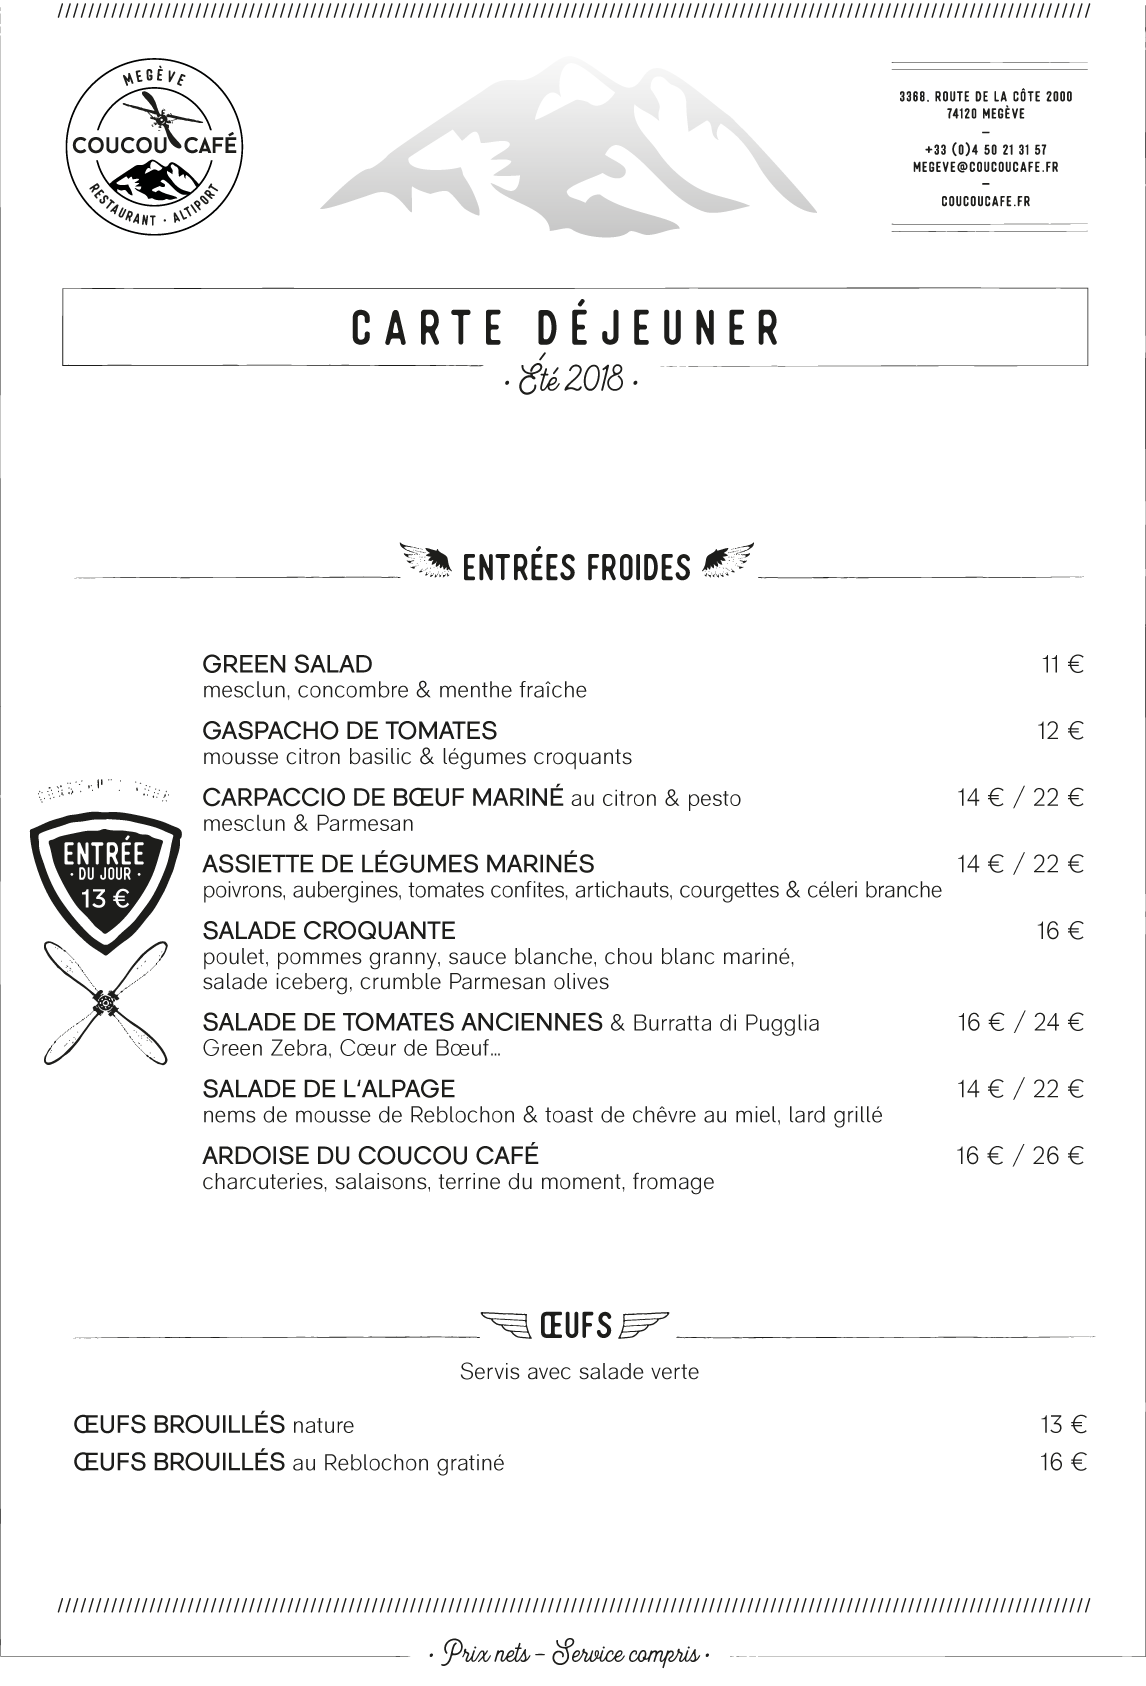 Carte Déjeuner Coucou Café - Eté 2018